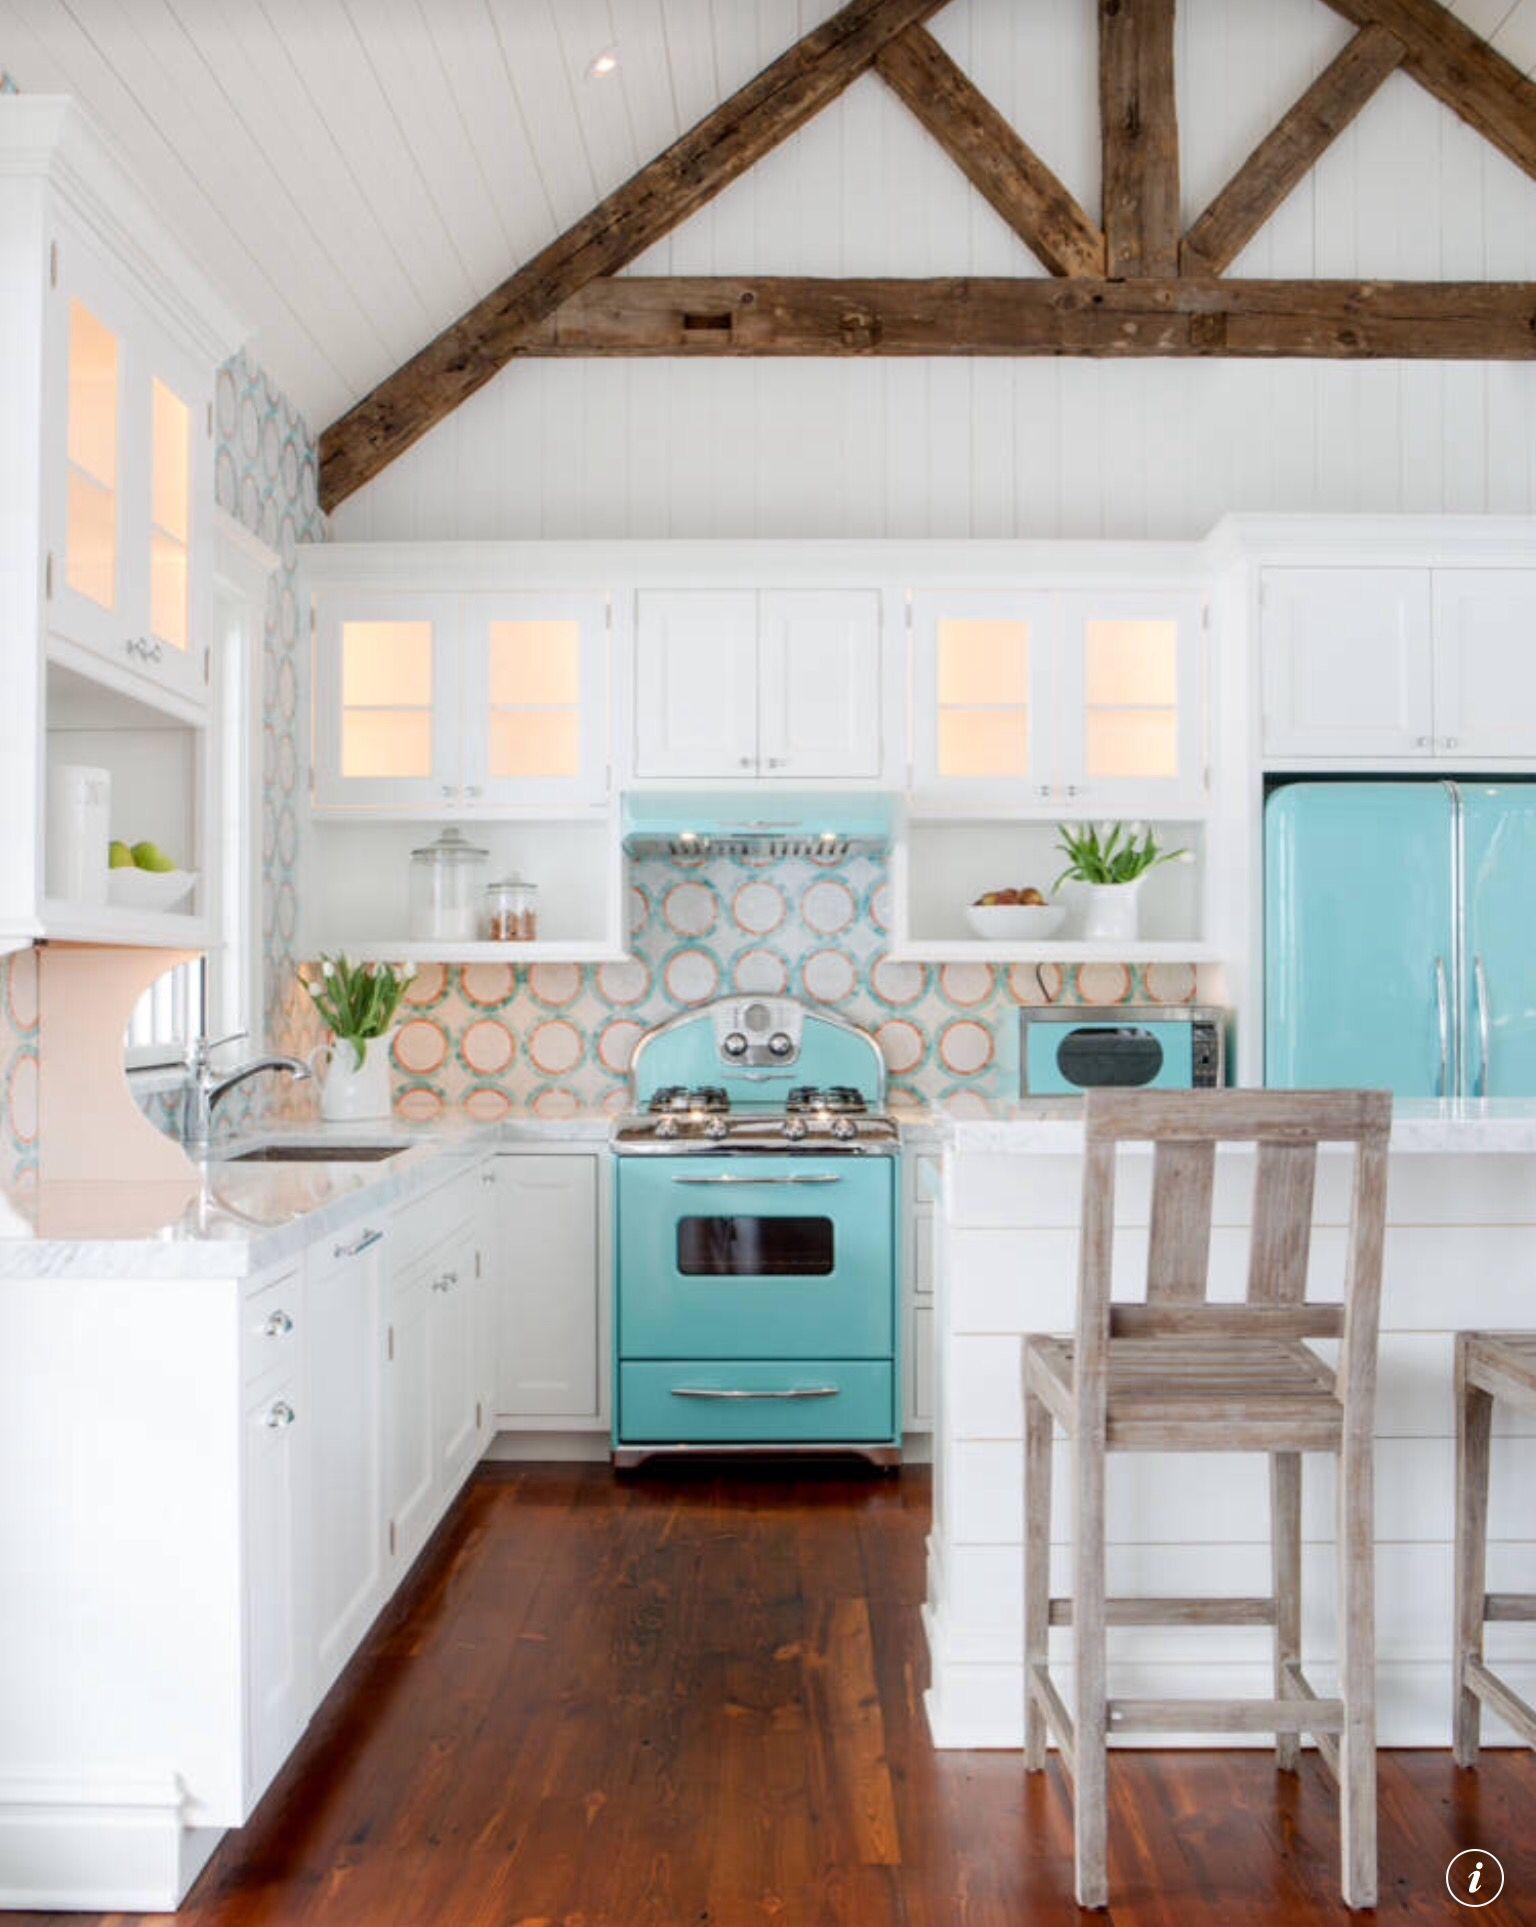 Pin de Chel B en Kitchens | Pinterest